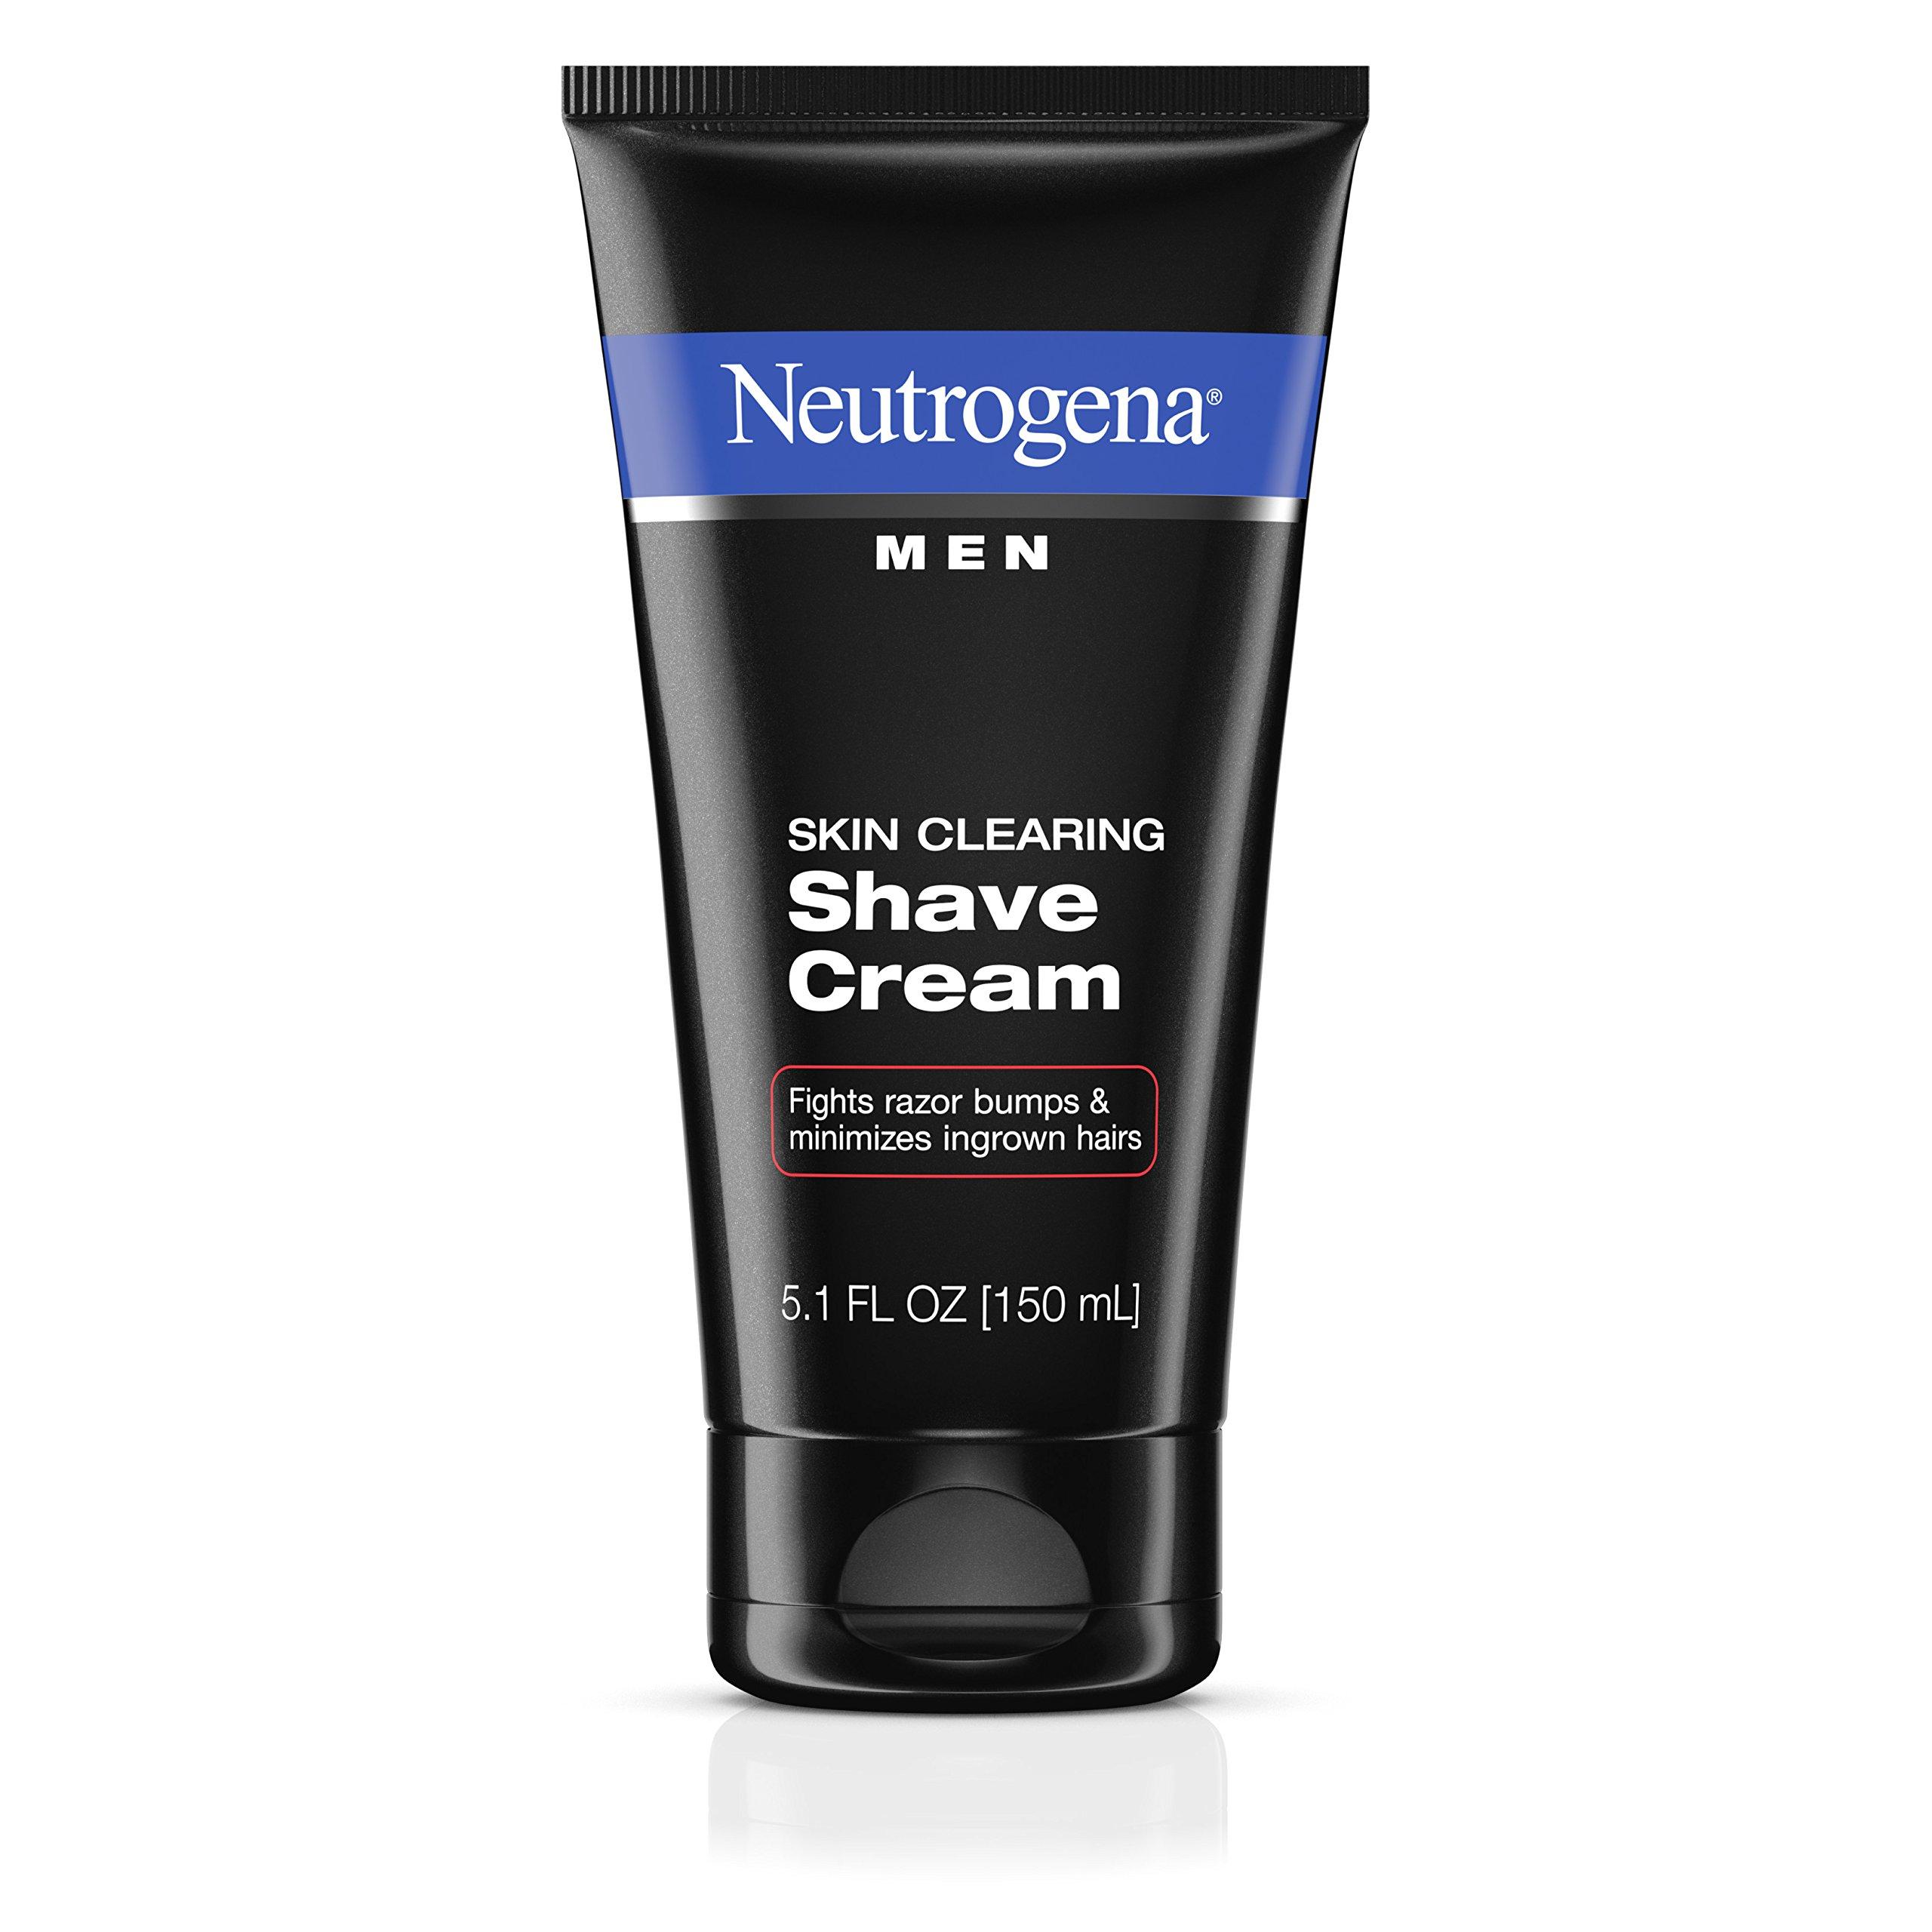 Neutrogena Men Skin Clearing Shave Cream, Oil-Free Shaving Cream to Help Prevent Razor Bumps & Ingrown Hairs, 5.1 fl. oz (Pack of 2)